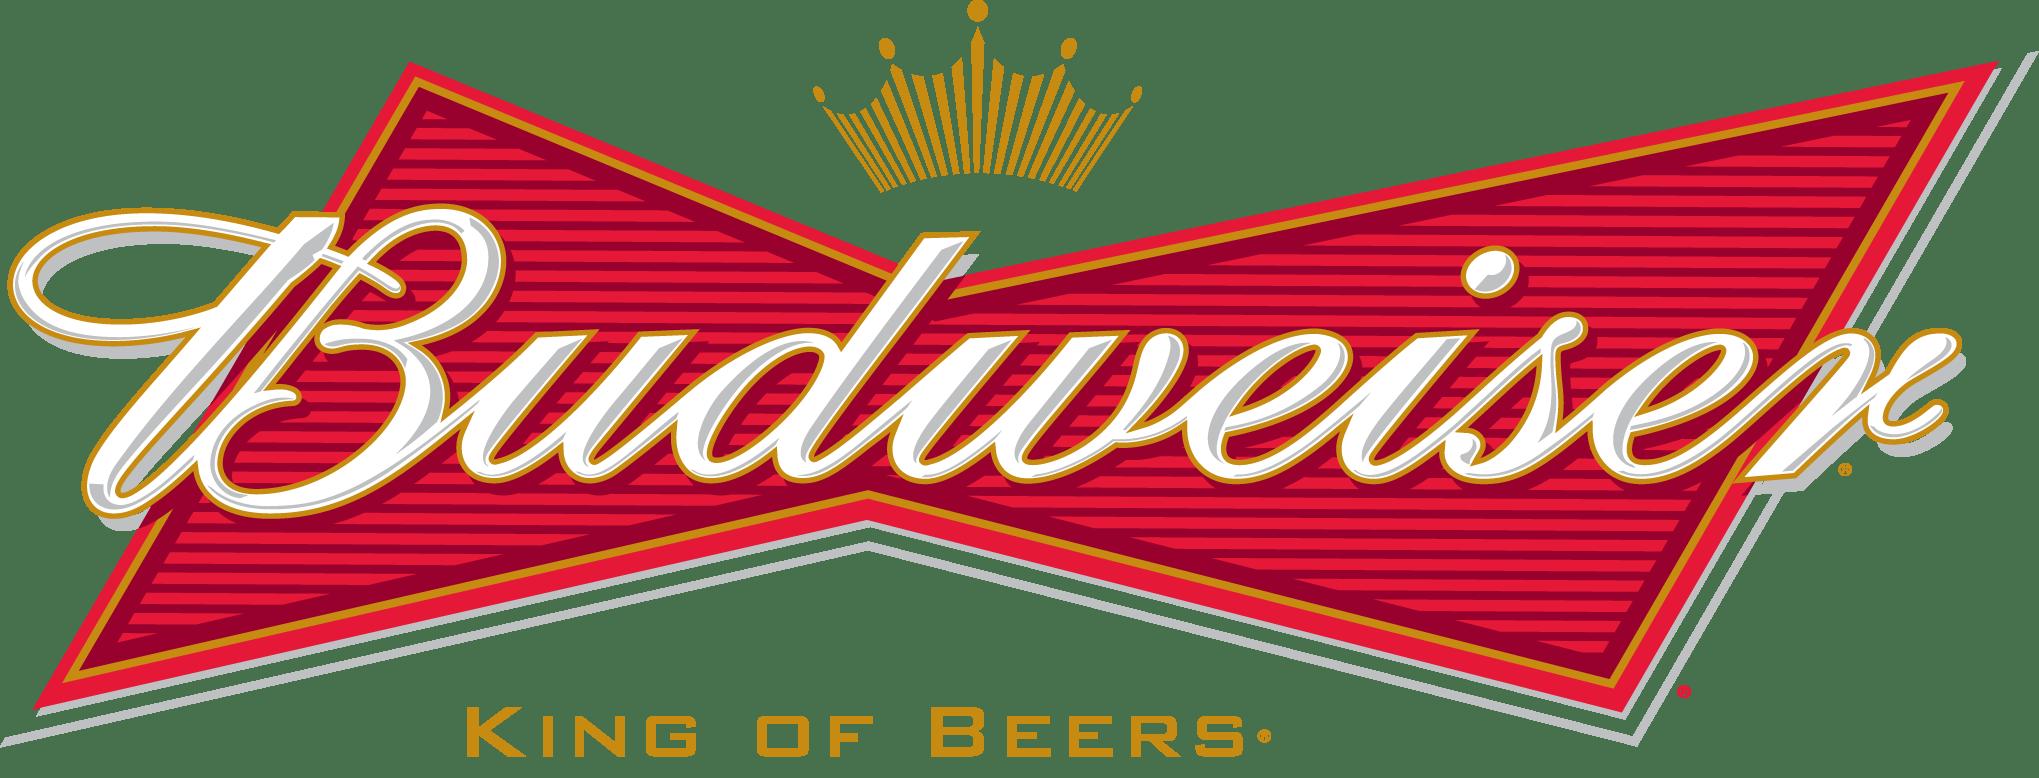 budweiser color logo rh bradentonarearegatta com budweiser logo crossword budweiser logopedia